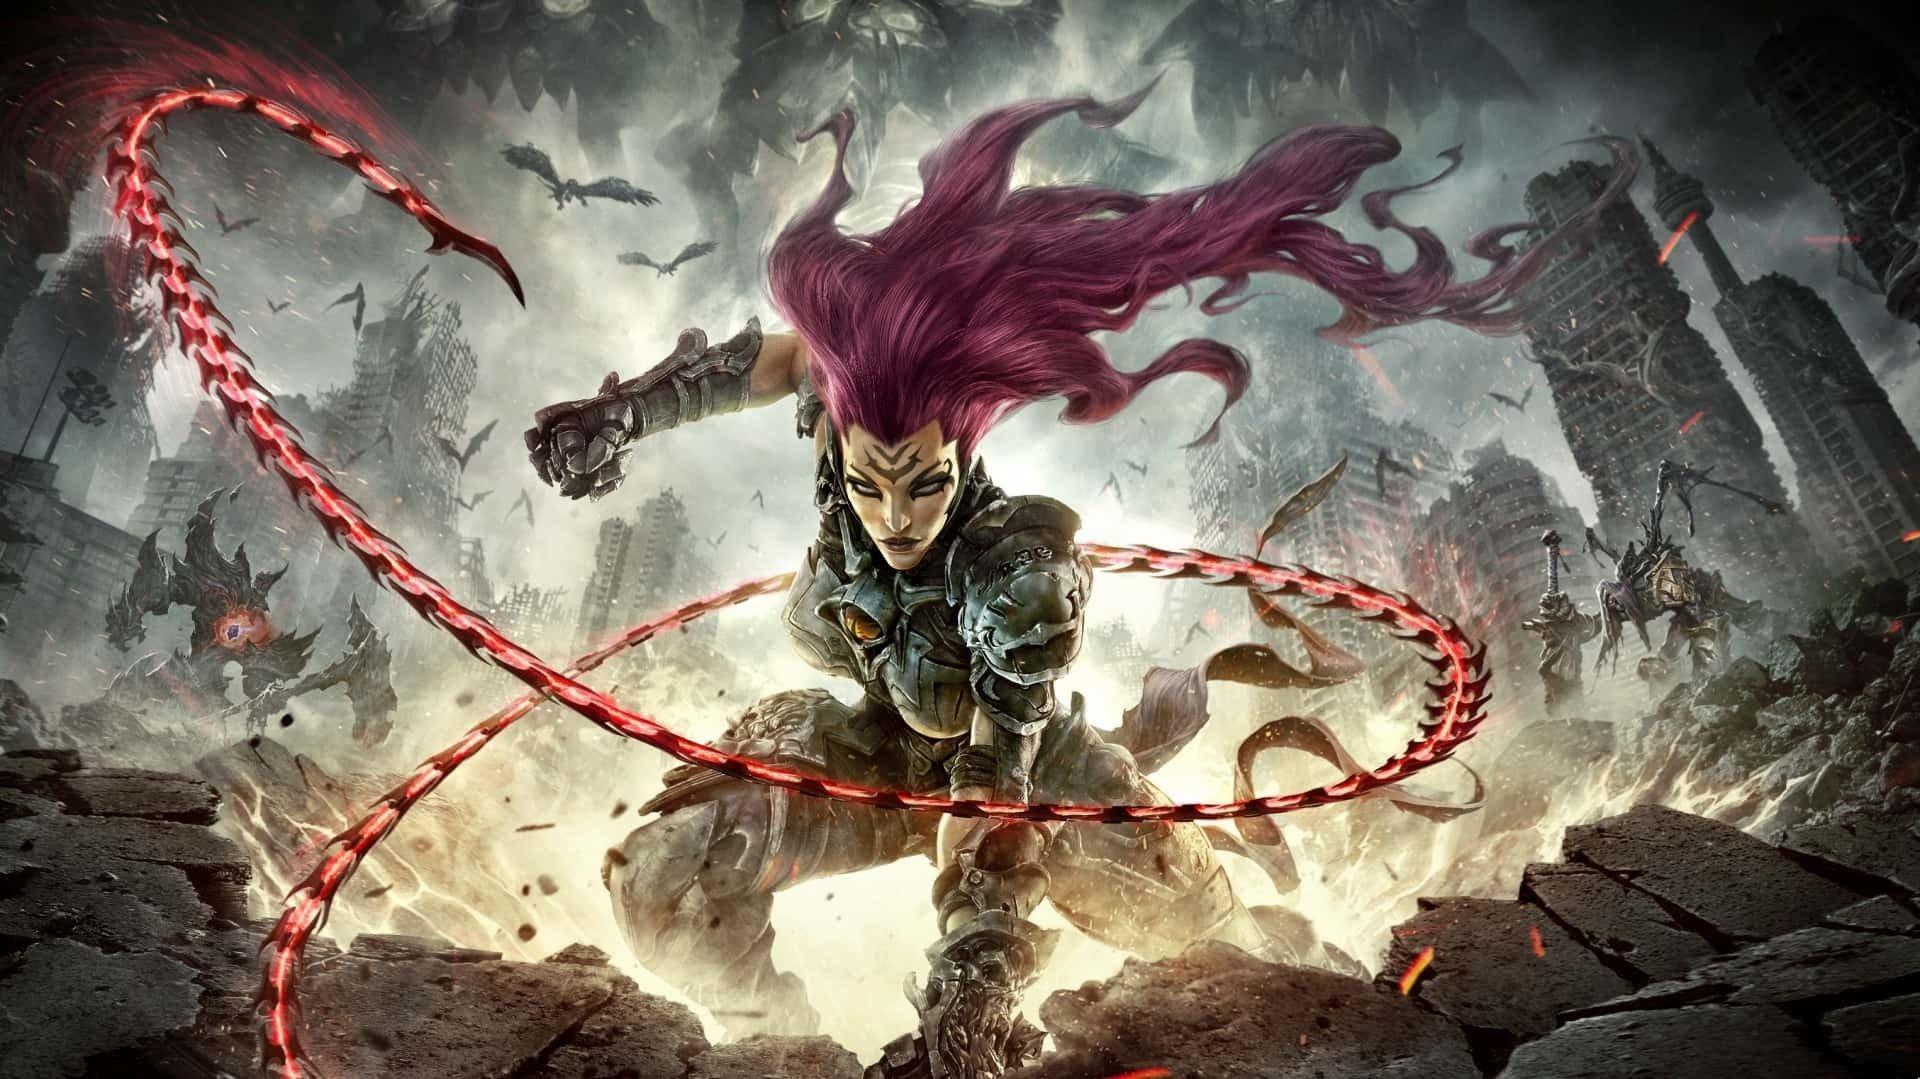 La première version jouable de Darksiders III sera présentée à Gamescom